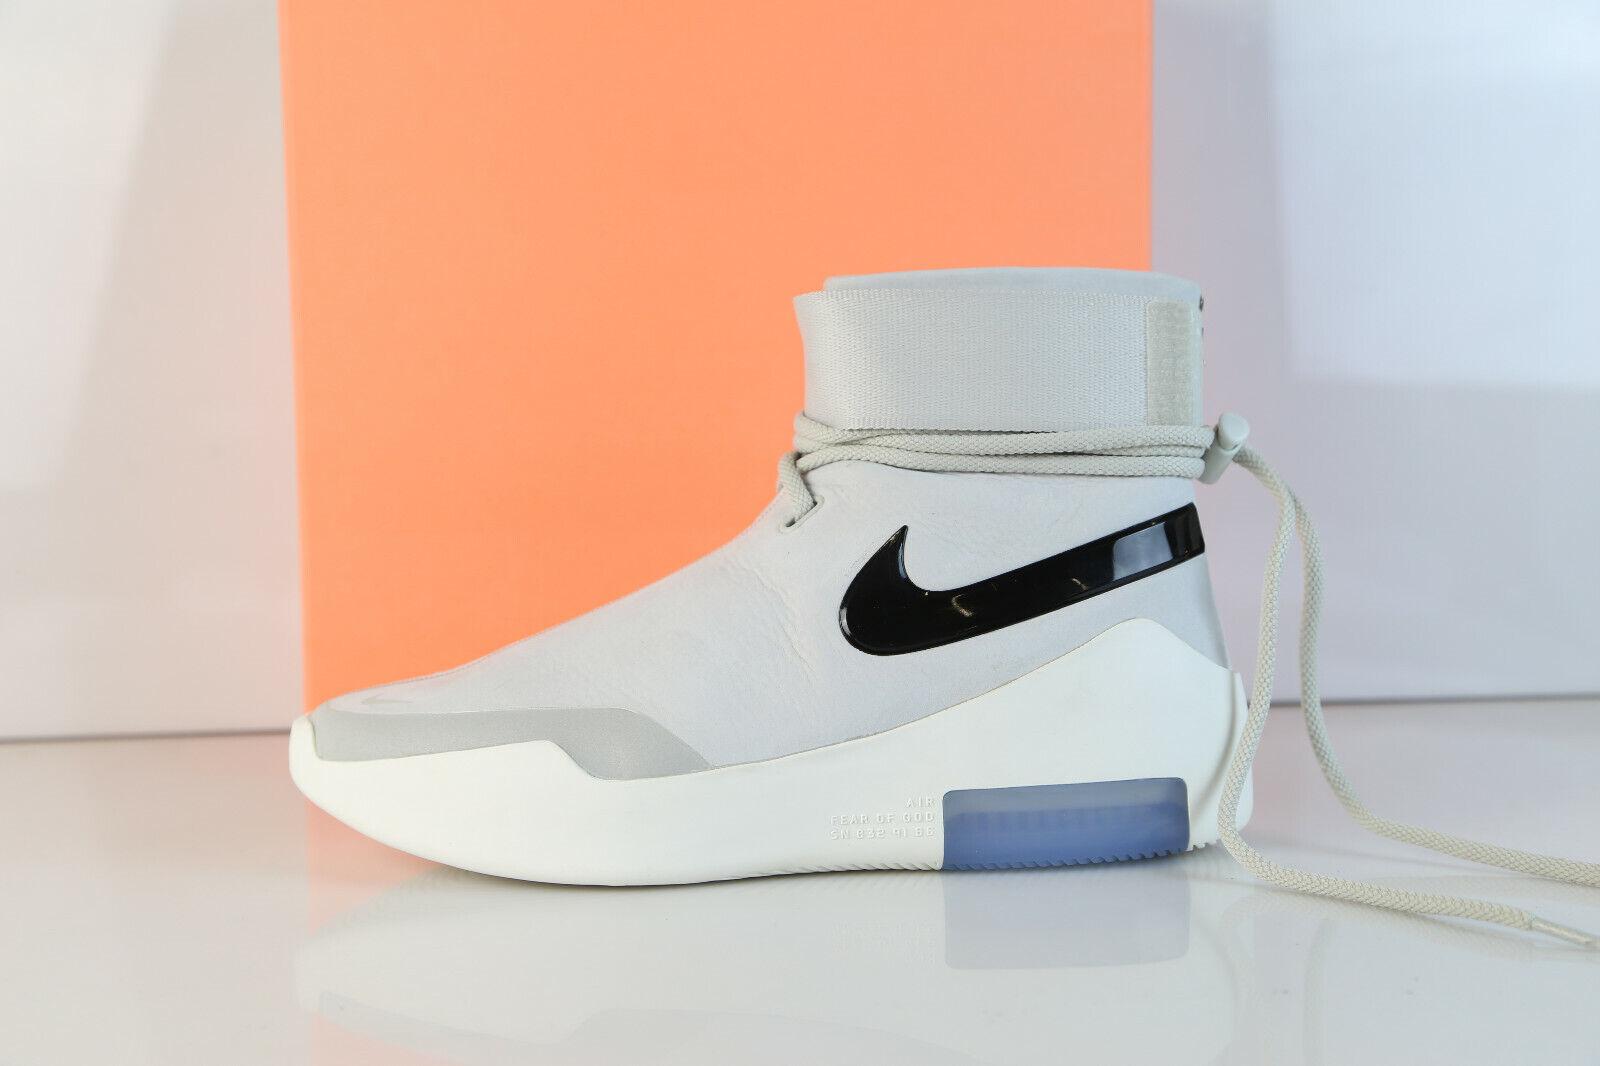 Nike X Fear of God Shoot Around SA Light Bone Black AT9915-002 11 fog